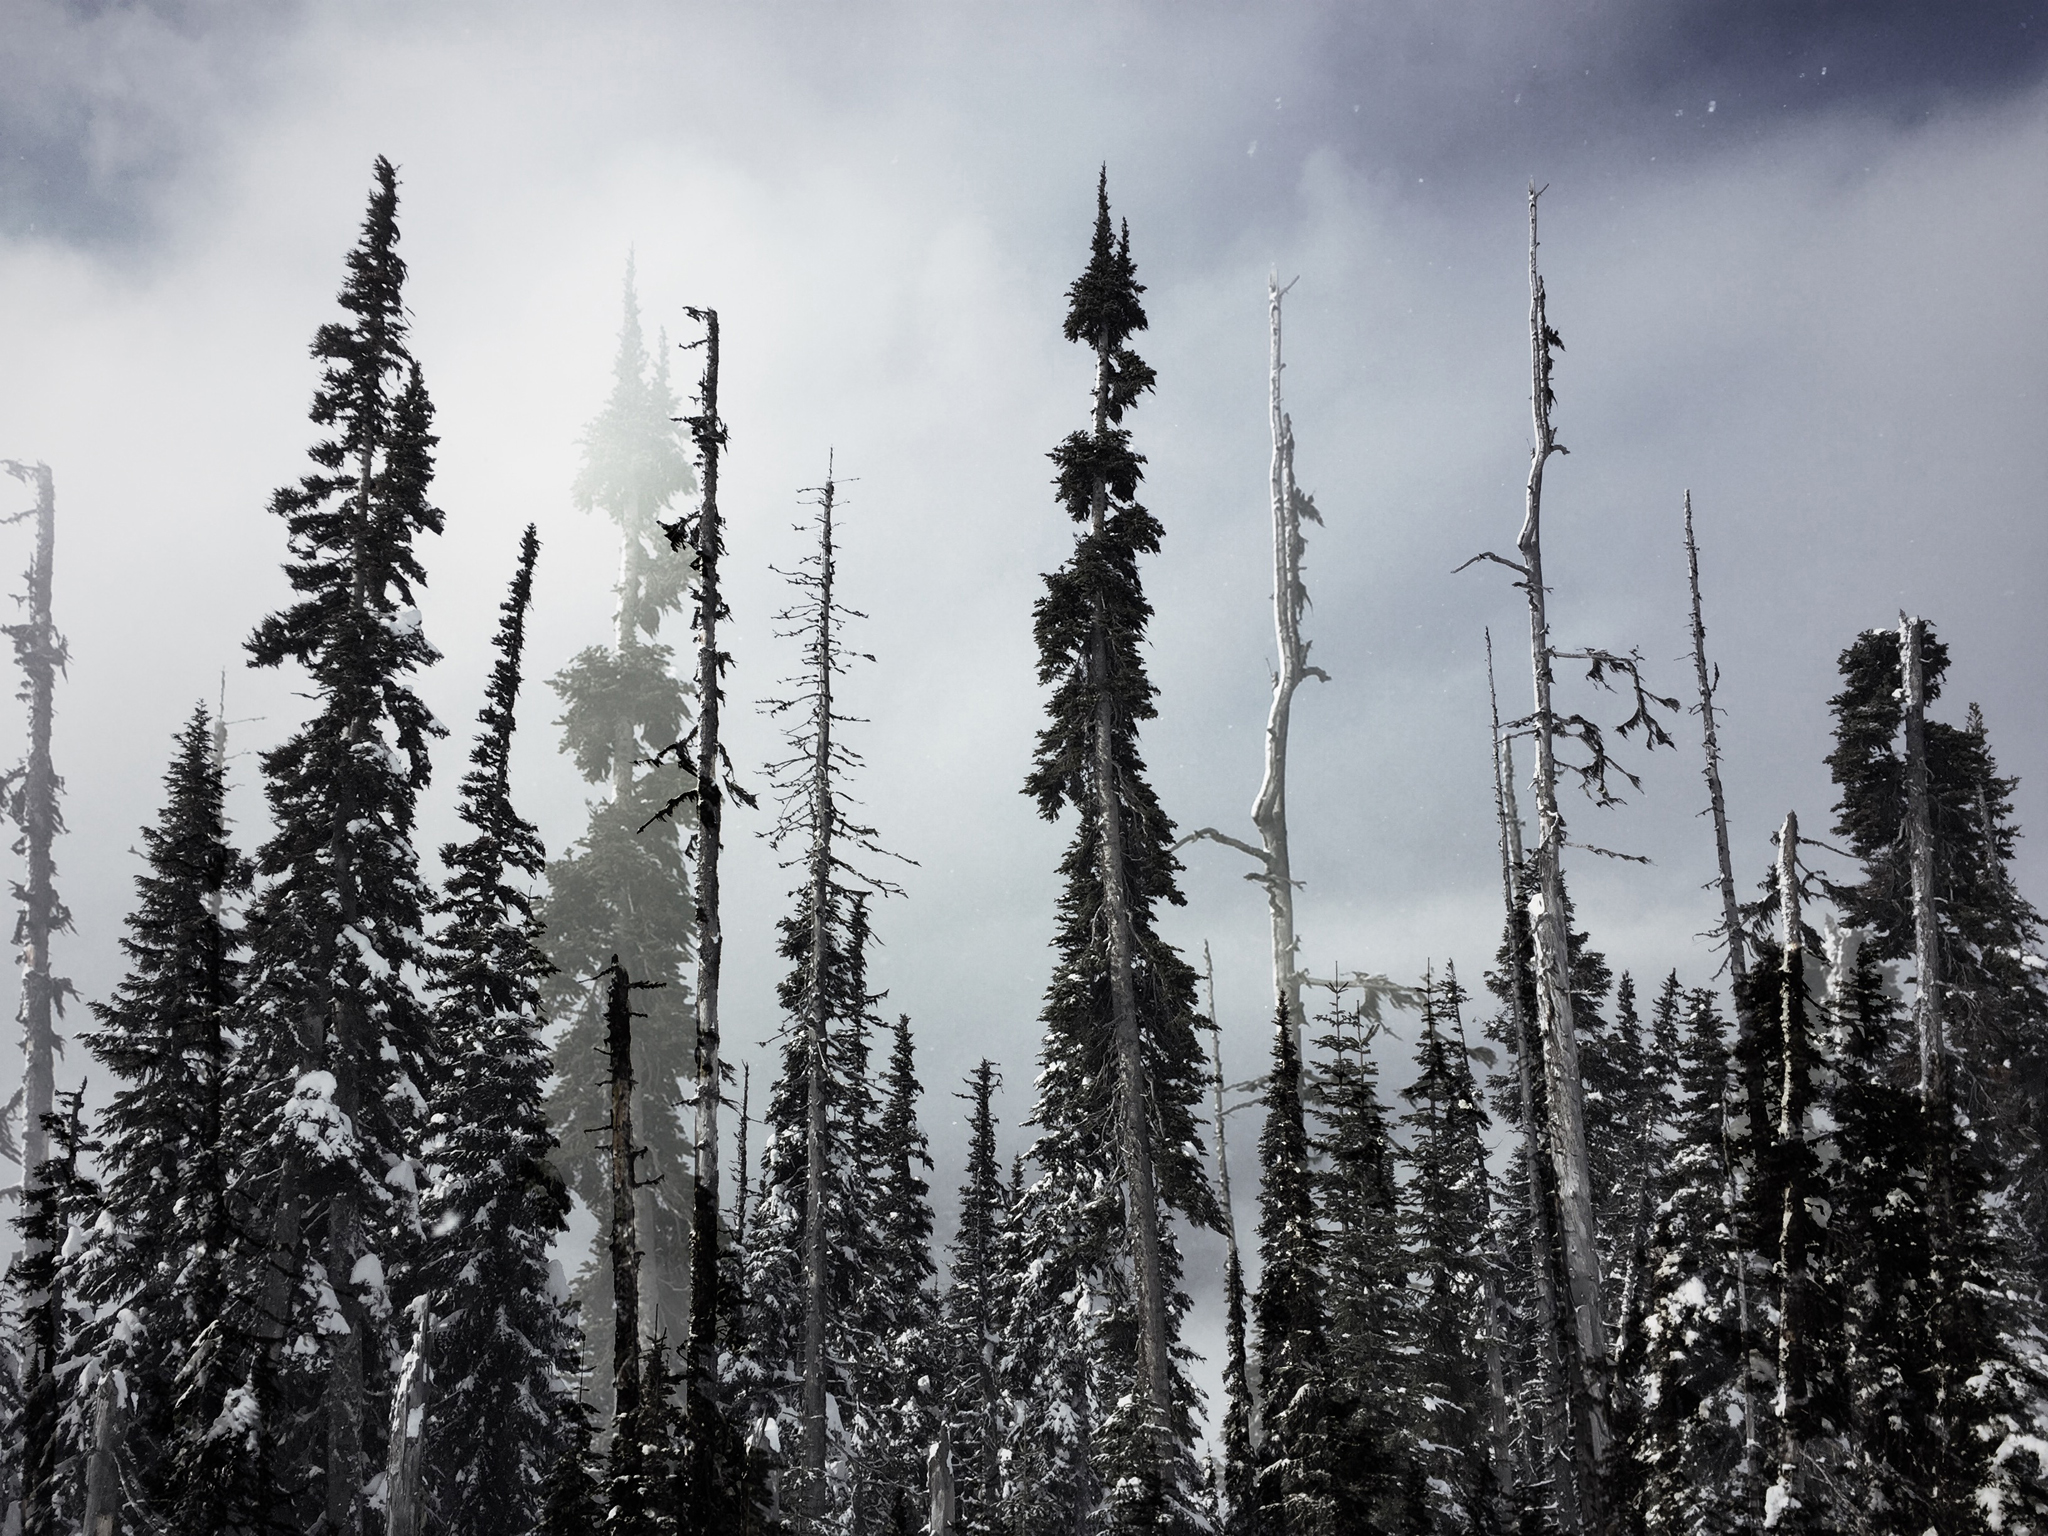 whistler-doubleexpotrees-final.jpg